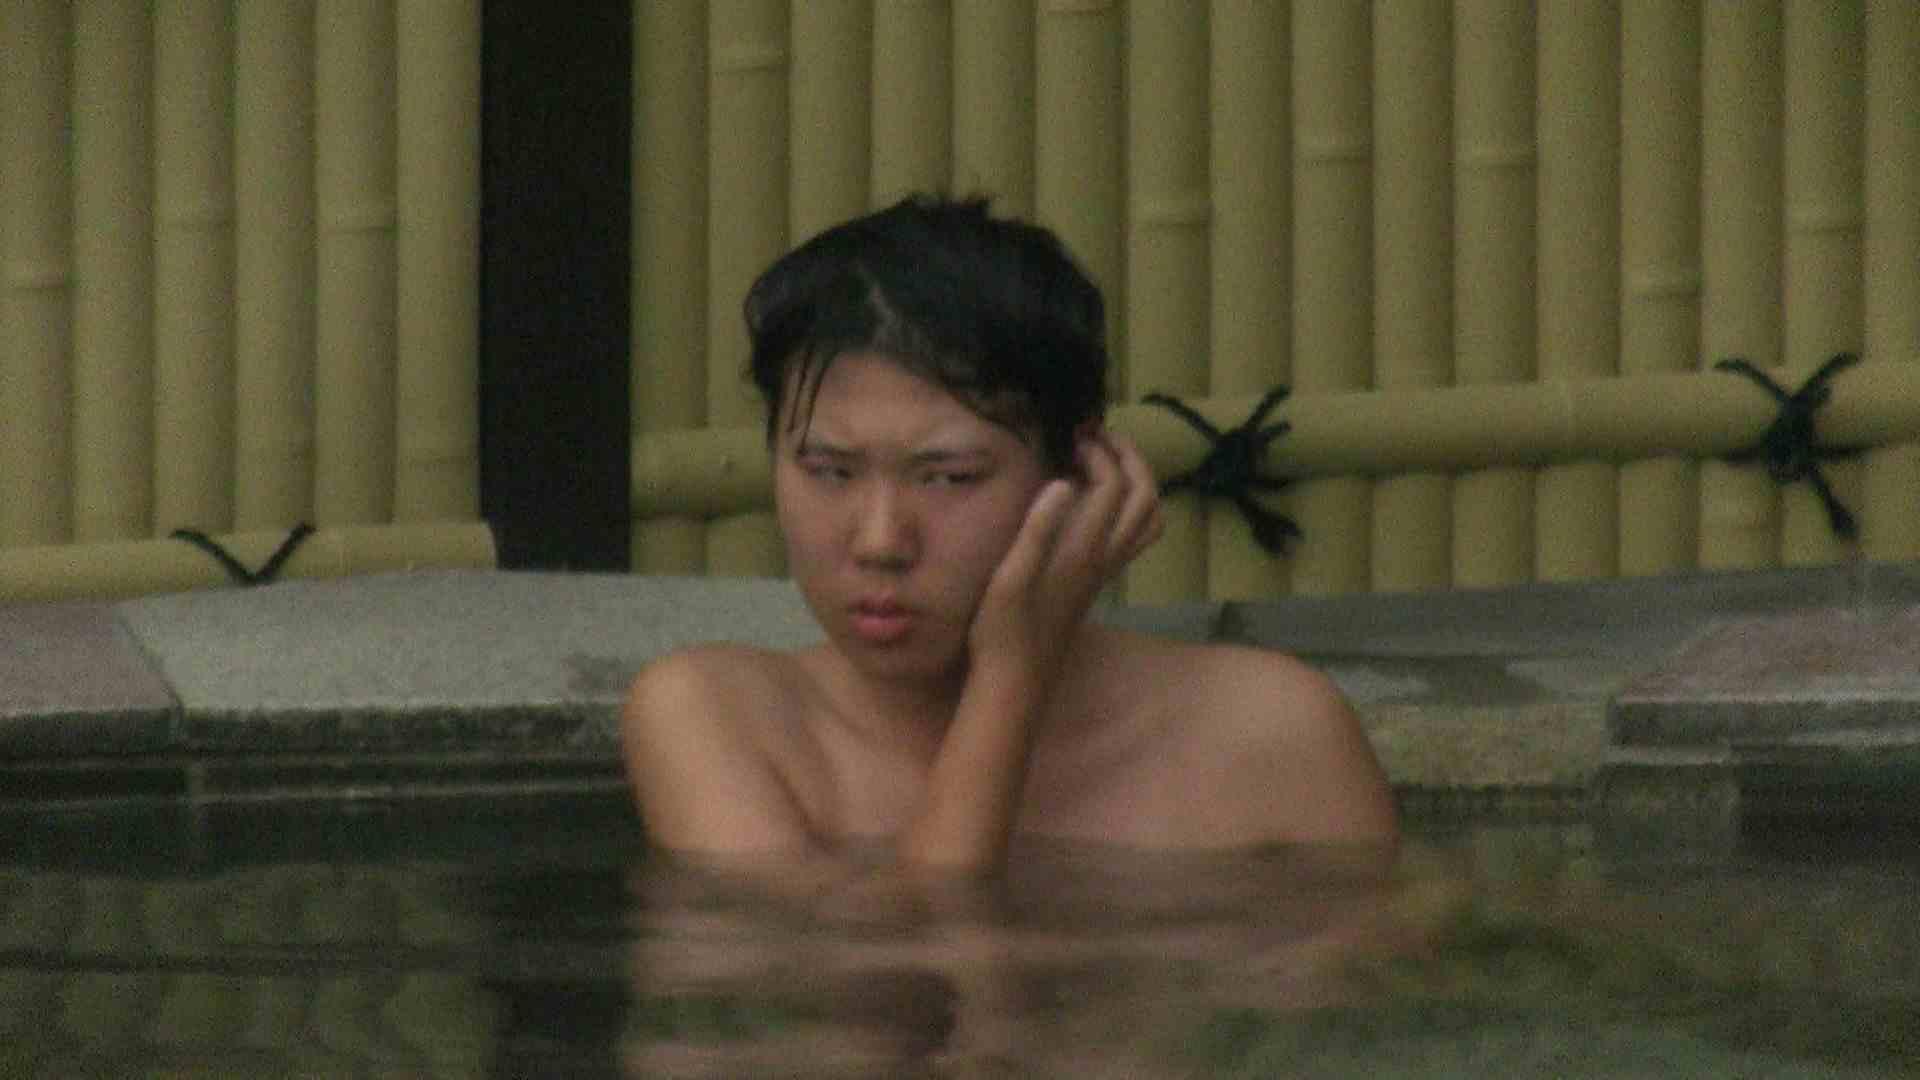 Aquaな露天風呂Vol.215 綺麗なOLたち  106枚 105